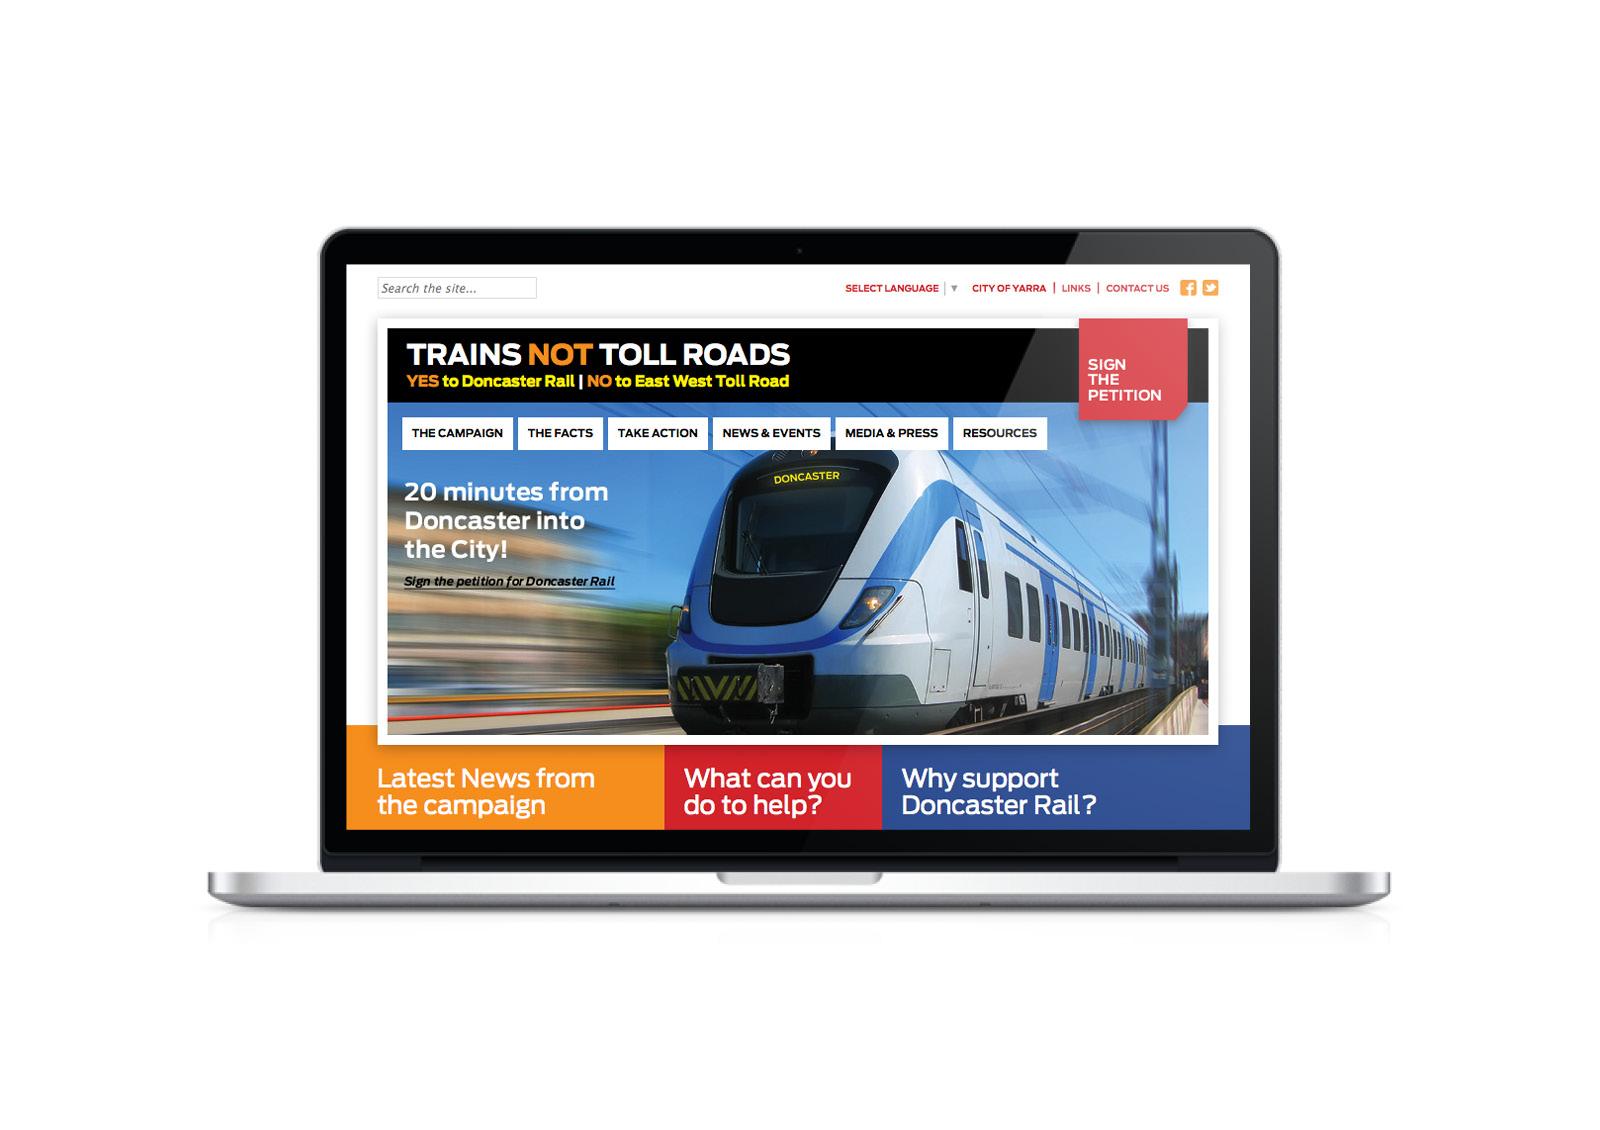 Trains Not Toll Roads